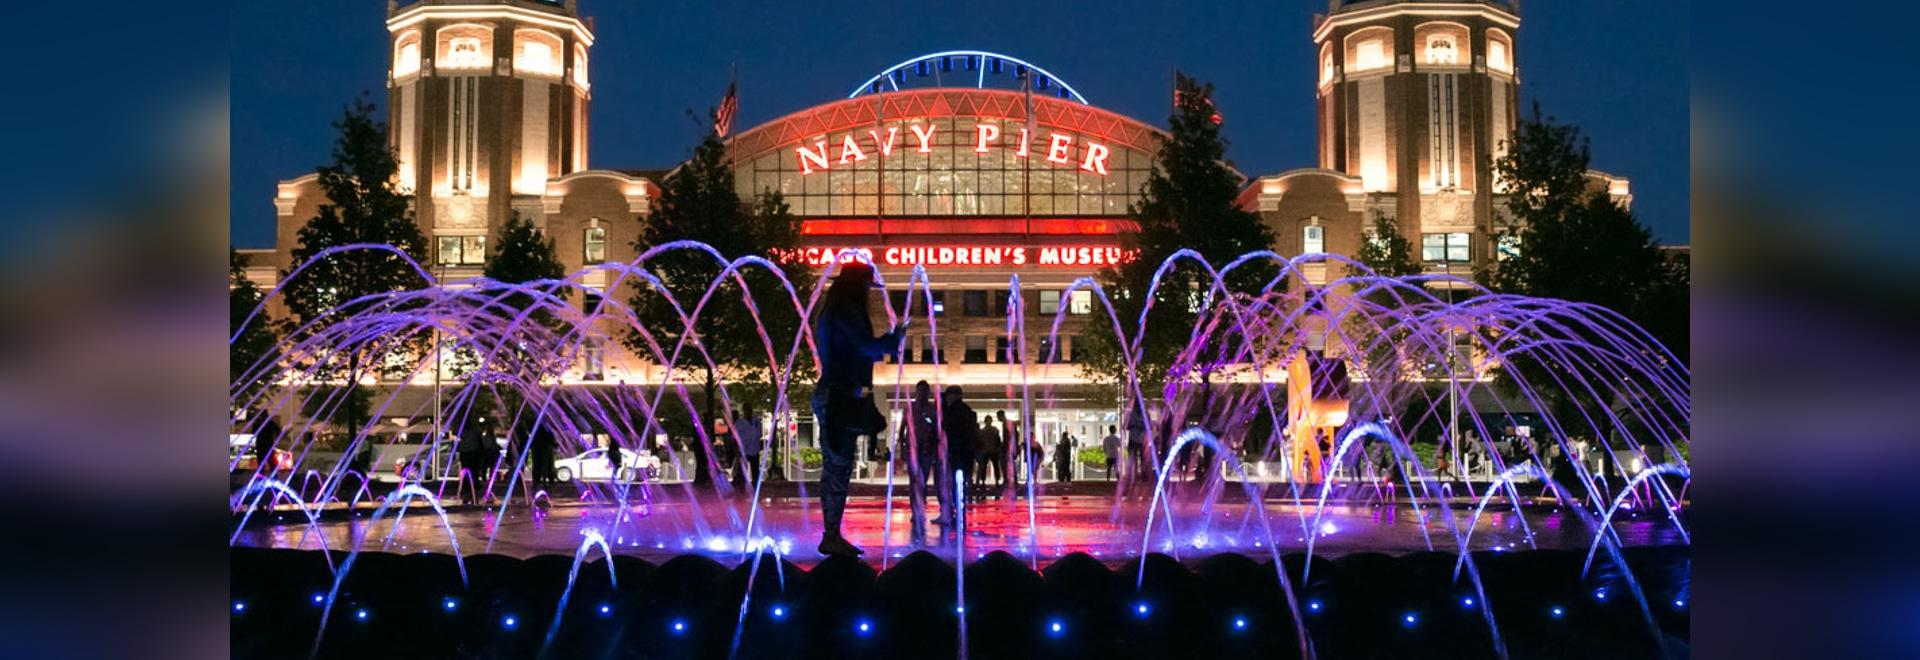 Polk Bros Park - Chicago's Navy Pier